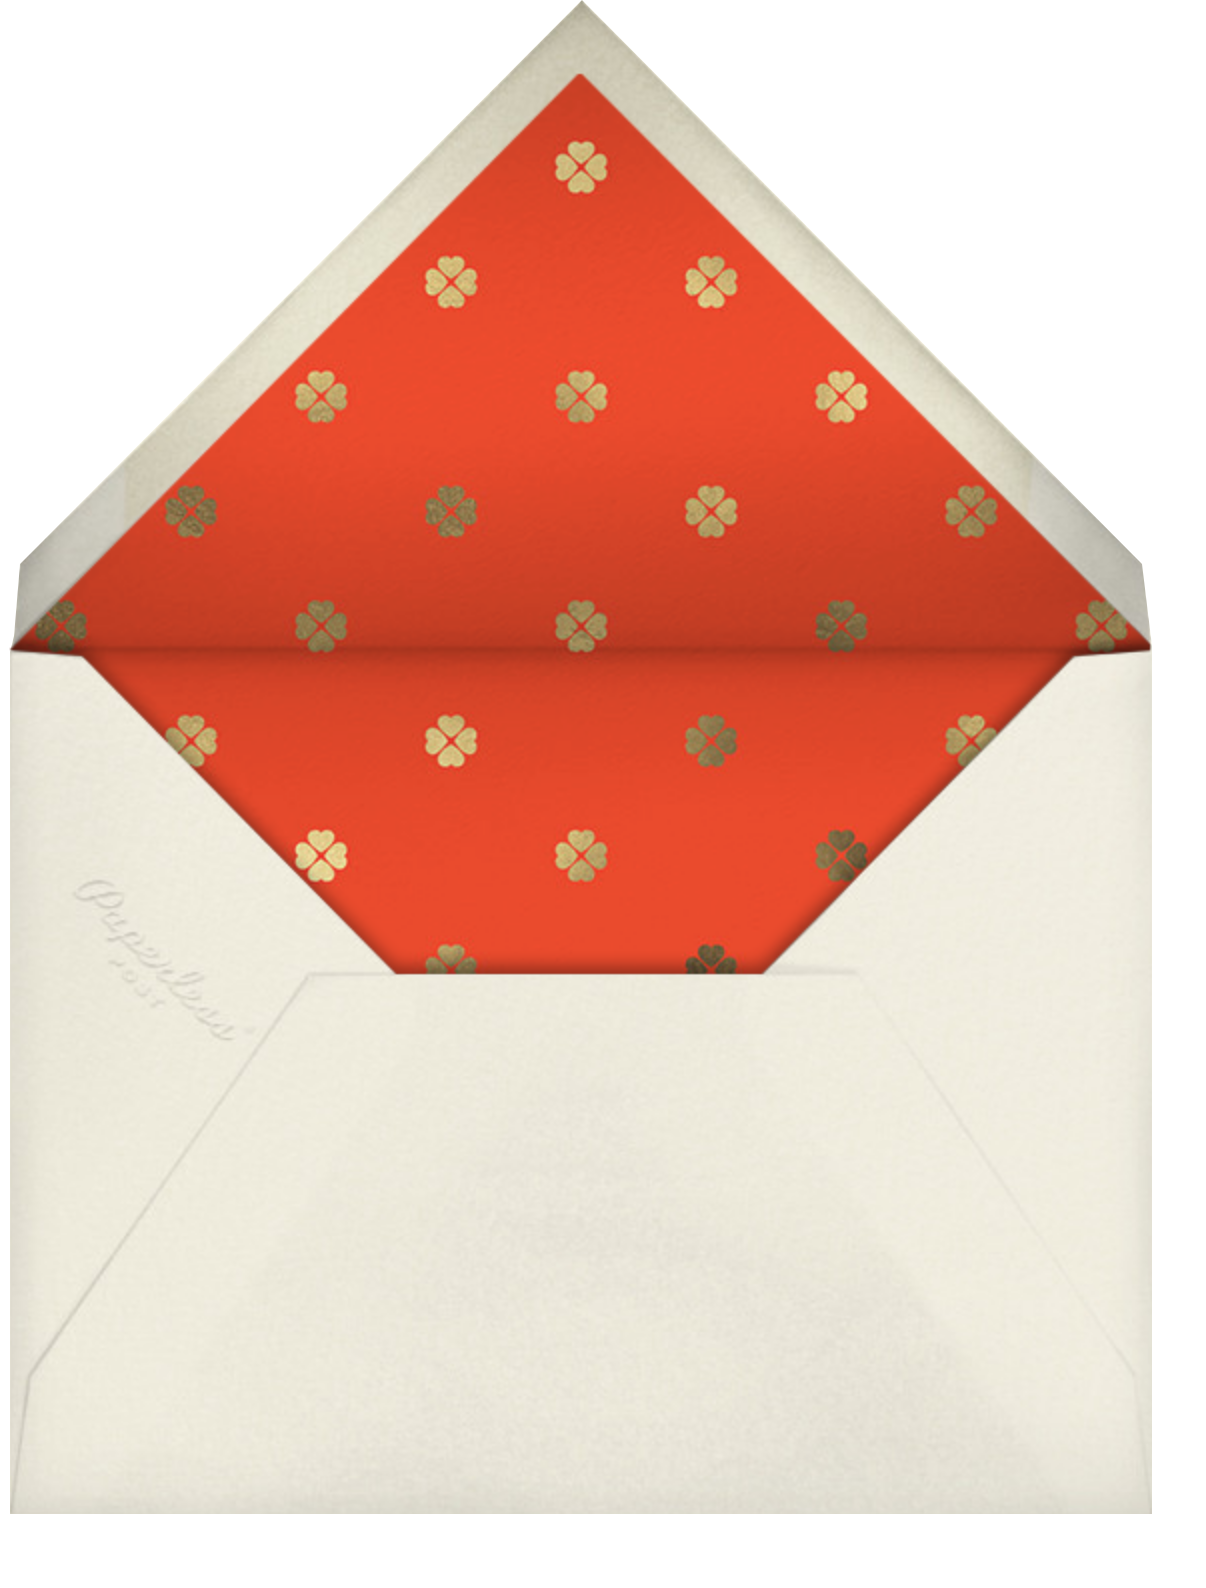 Mod Stripes - kate spade new york - Adult birthday - envelope back